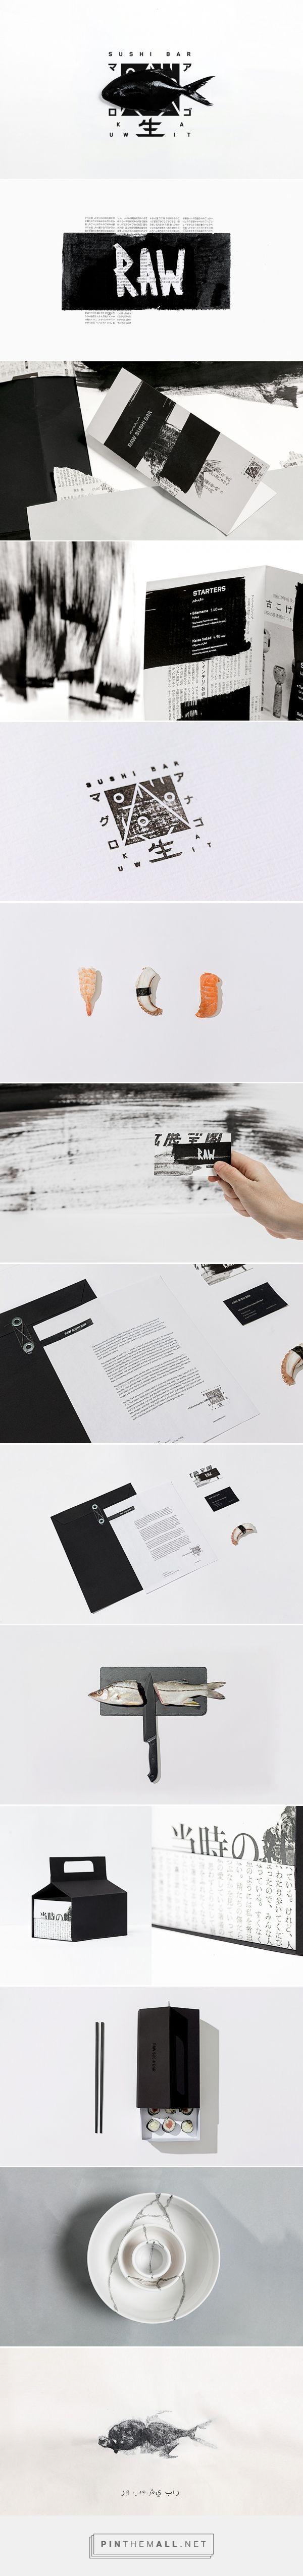 RAW | Futura - created via